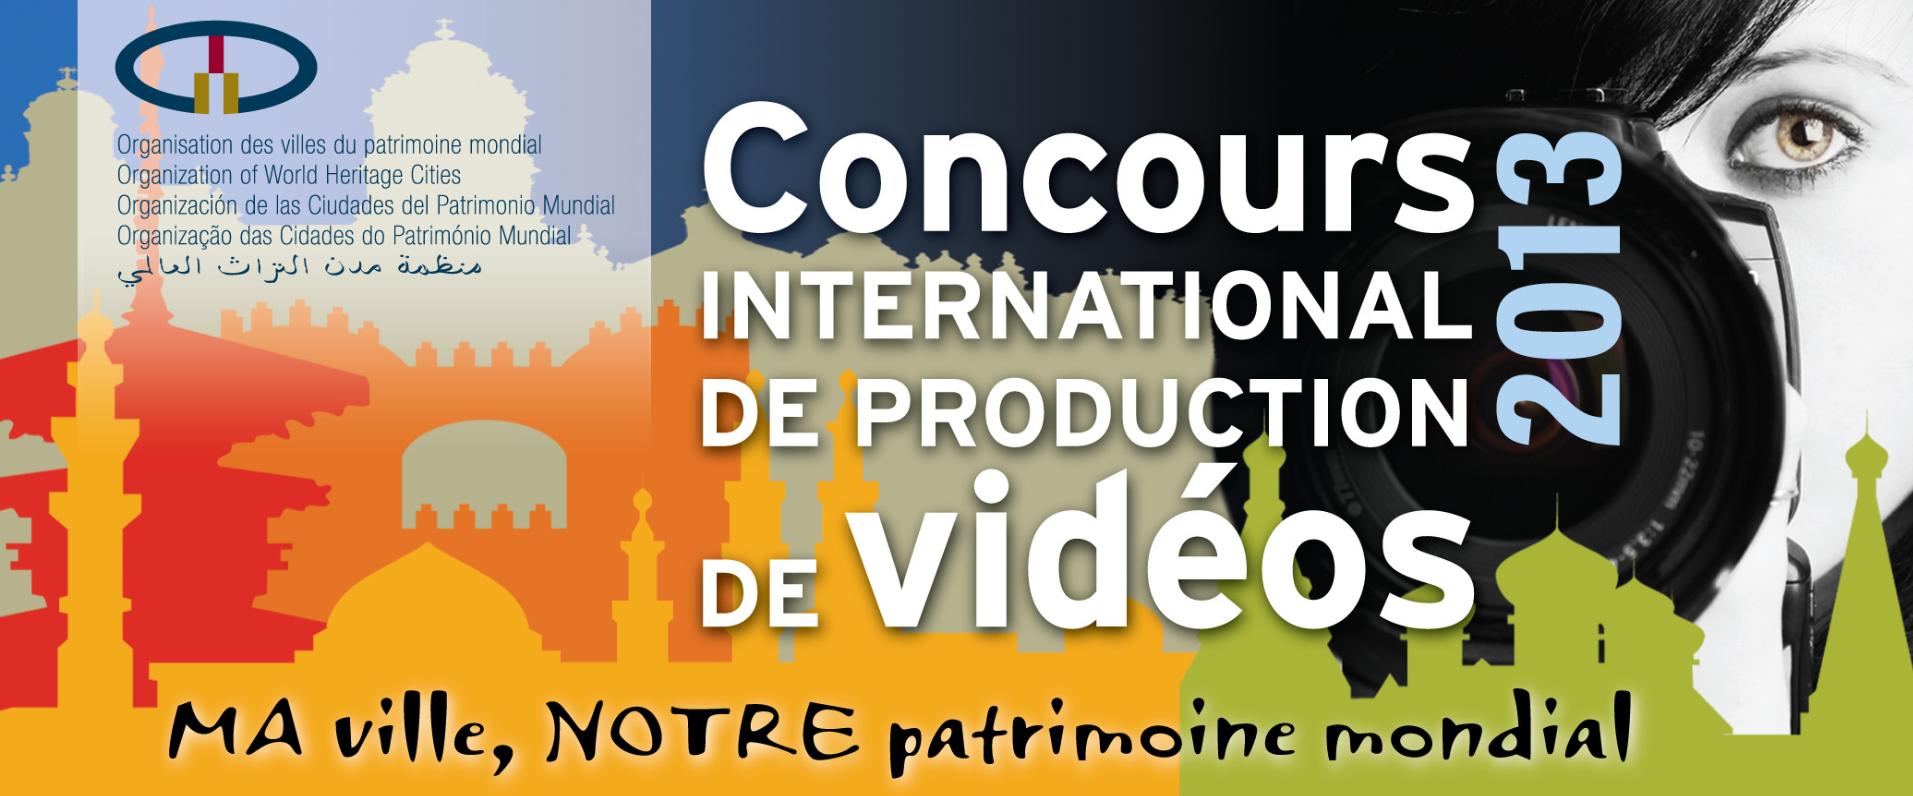 ovpm_-_concours_de_production_de_videos_-_grande_bande